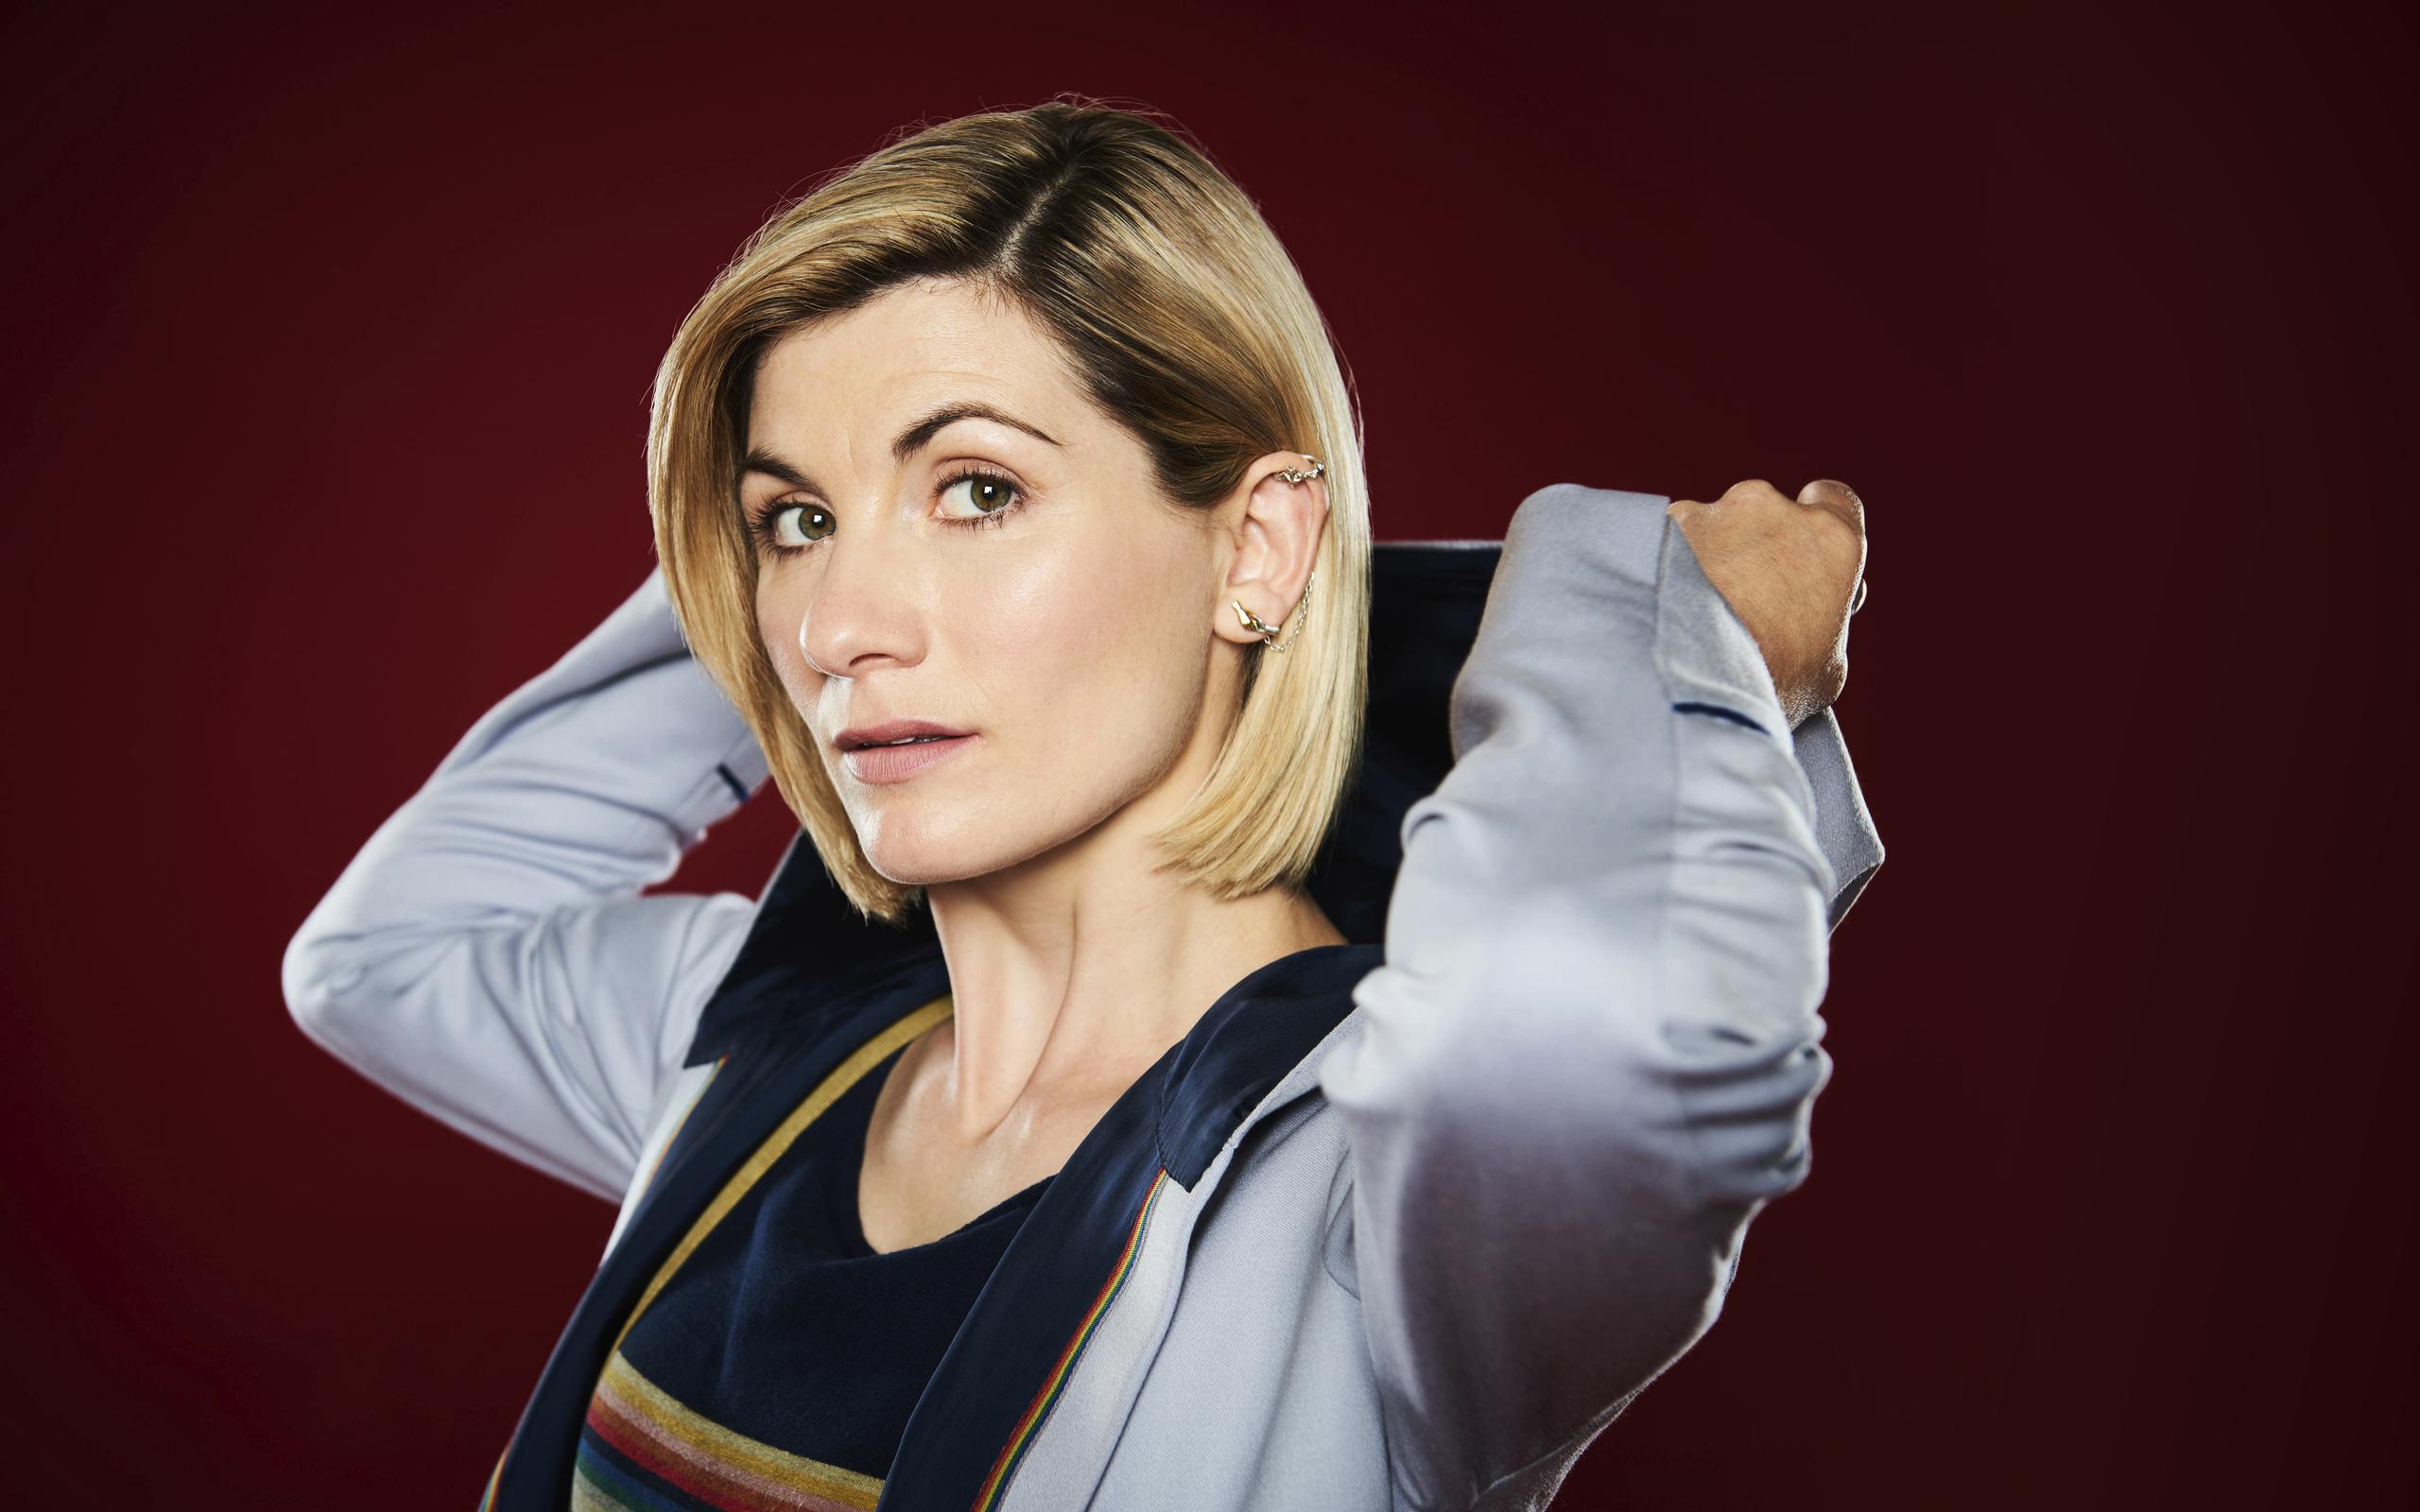 2560x1600 Jodie Whittaker In Doctor Who 2560x1600 Resolution Hd 4k